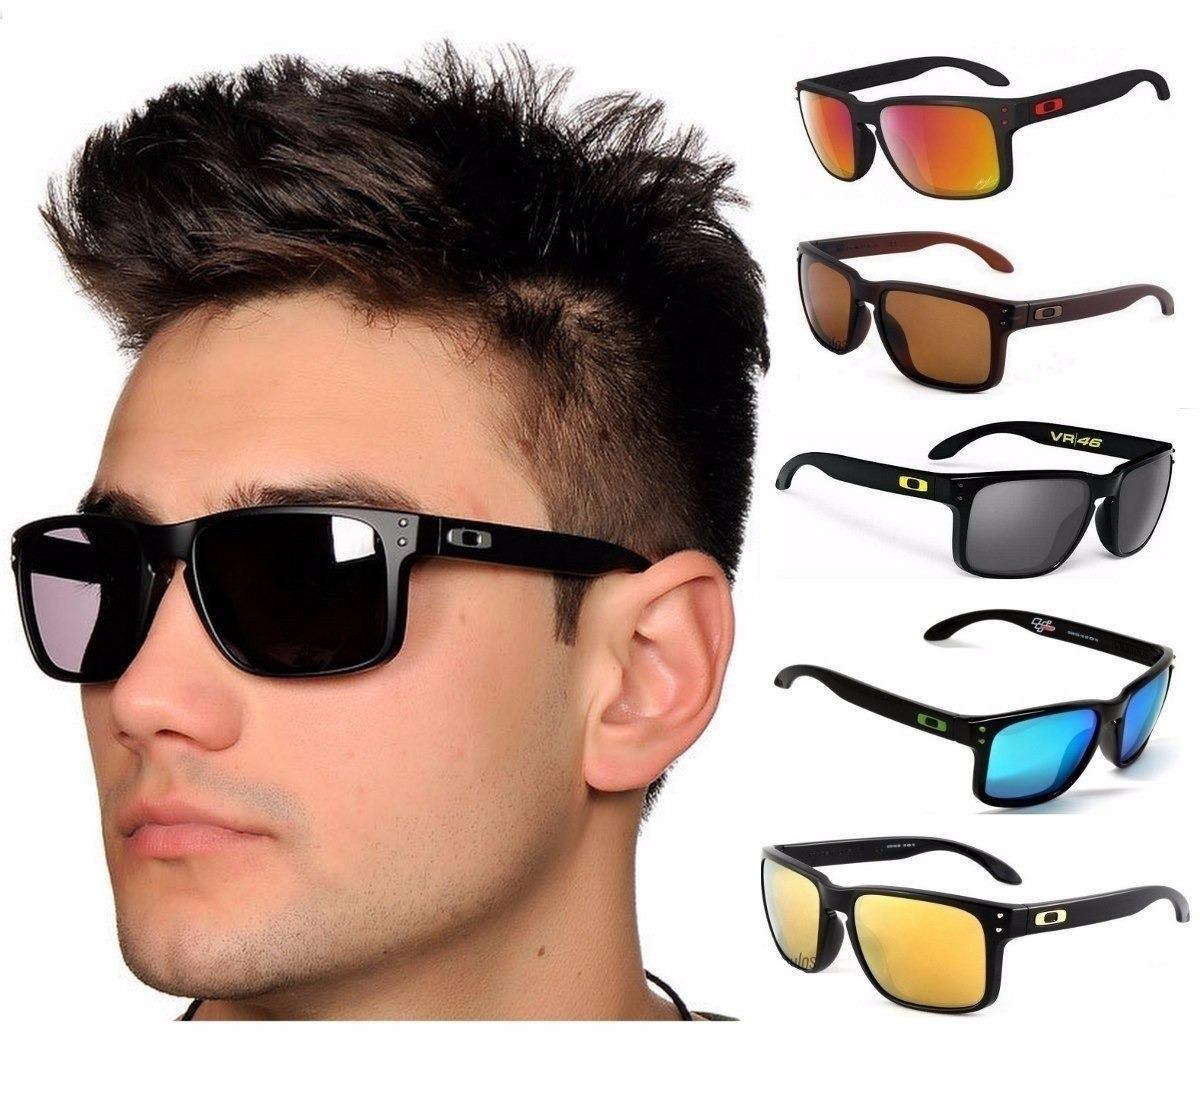 4389d5bfc79f7 kit 10 óculos sol holbrook justin polarizados. Carregando zoom.